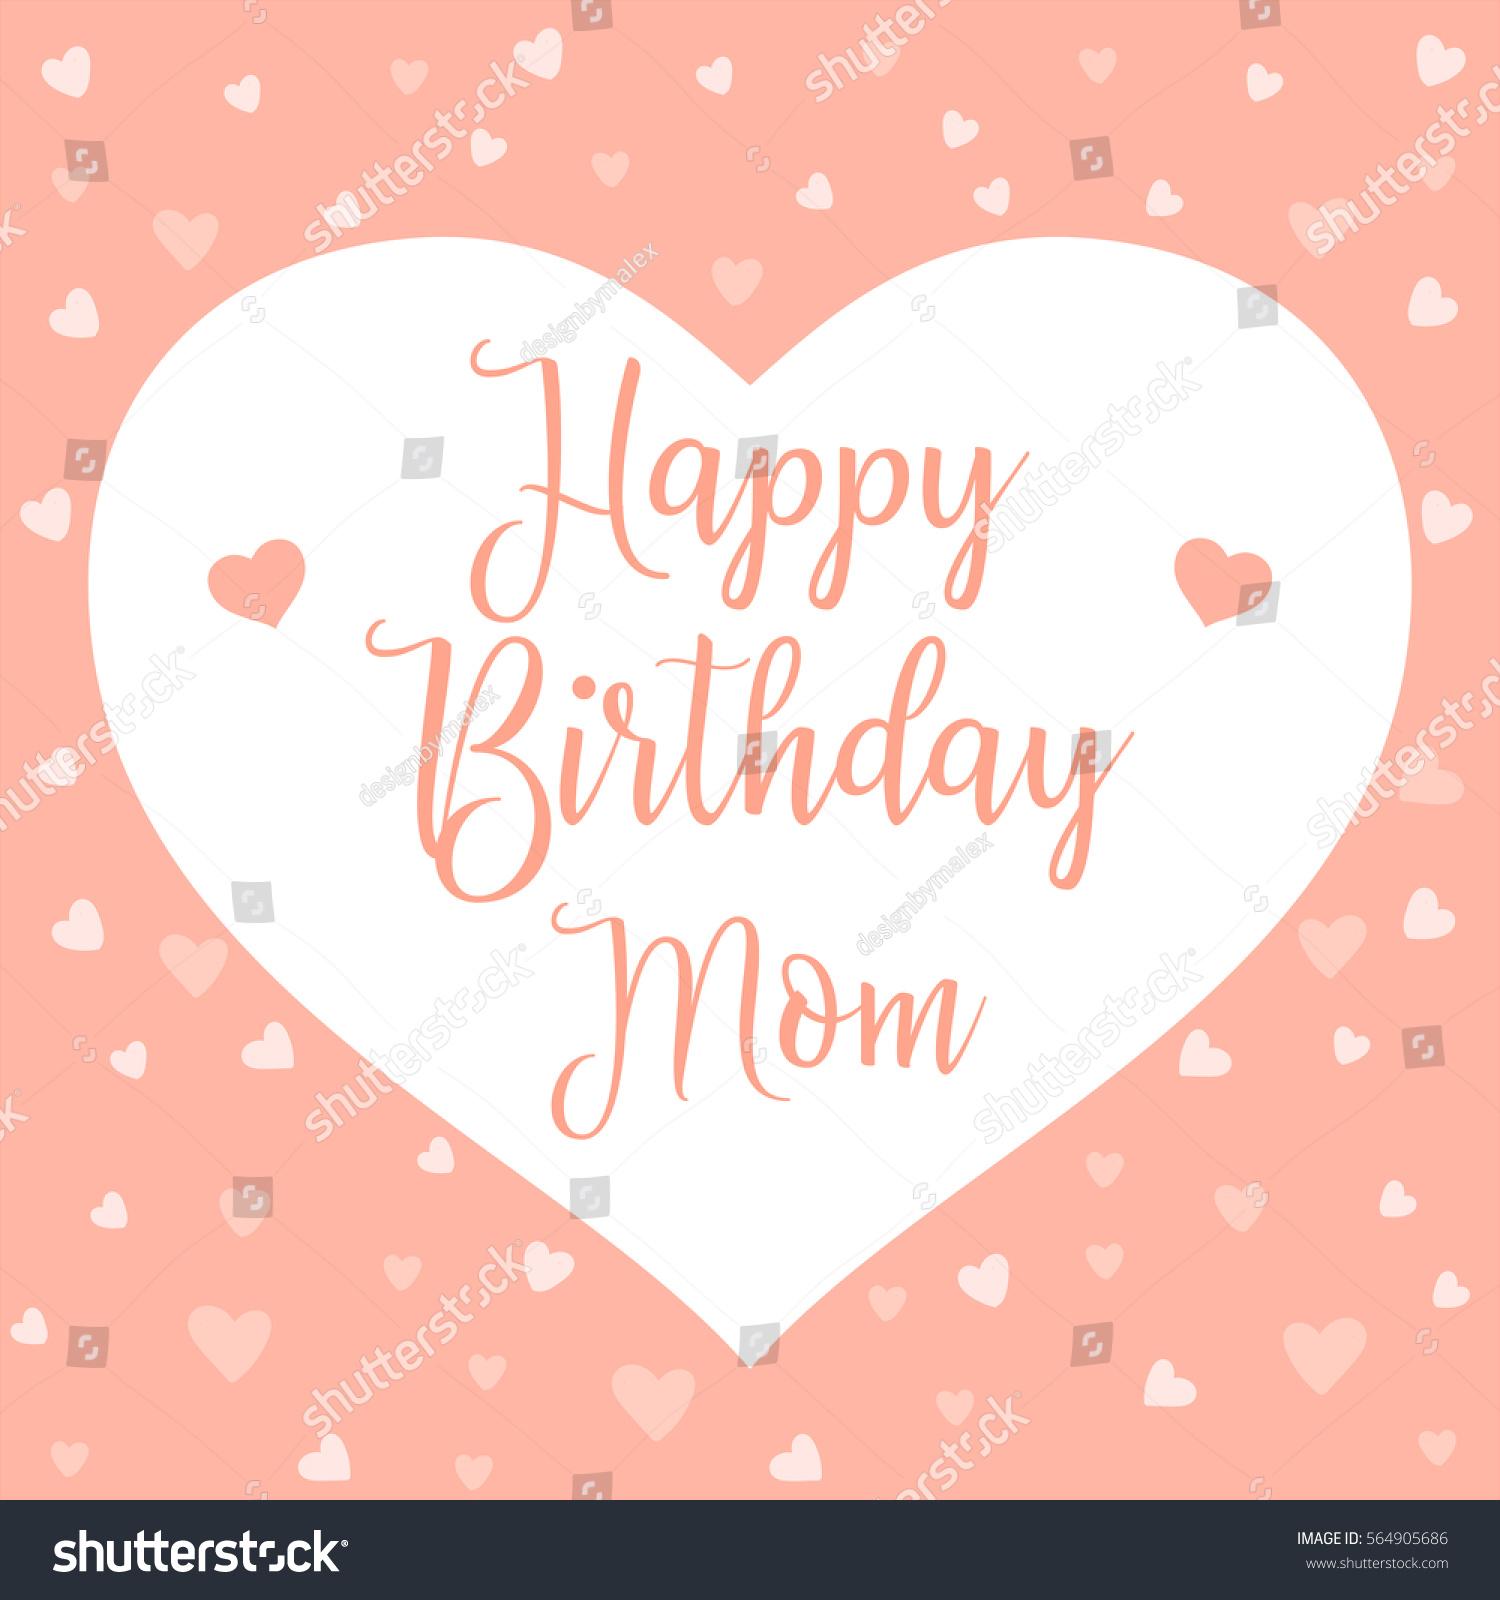 Happy Birthday Mom Mother Day Card Vector 564905686 – Happy Birthday Day Cards